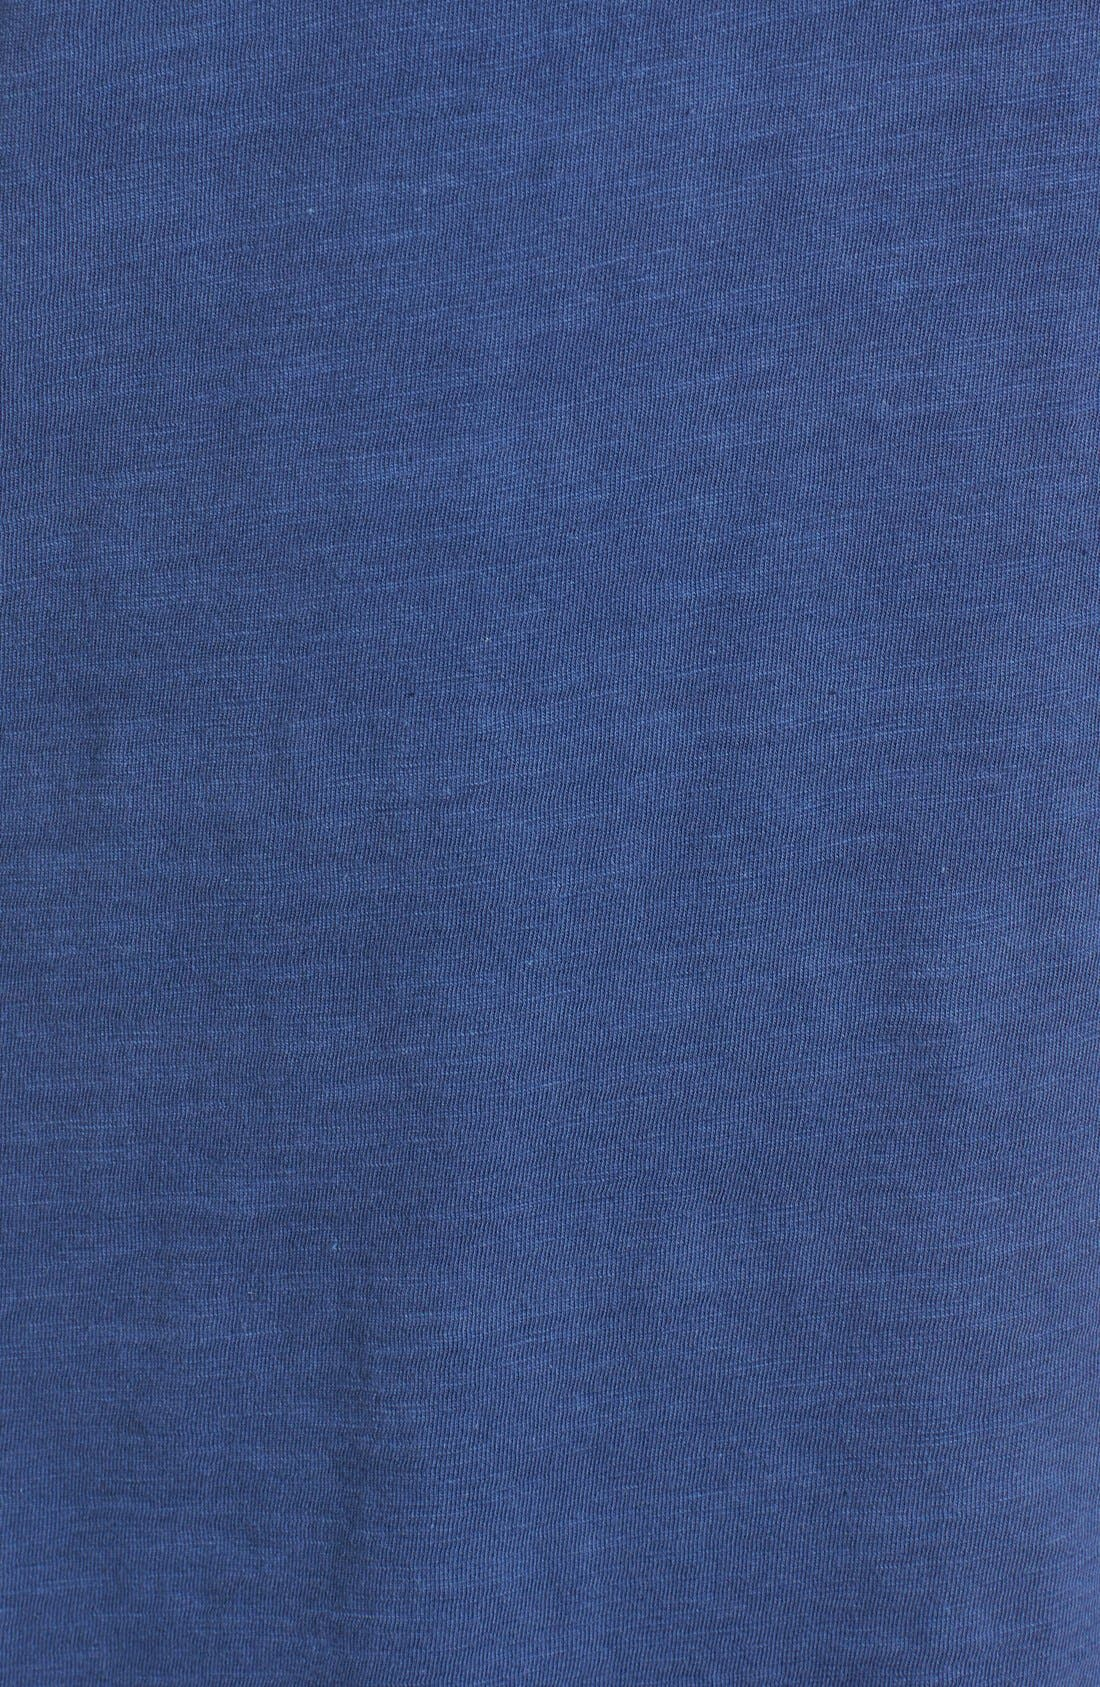 Organic Cotton V-Neck Tee,                             Alternate thumbnail 114, color,